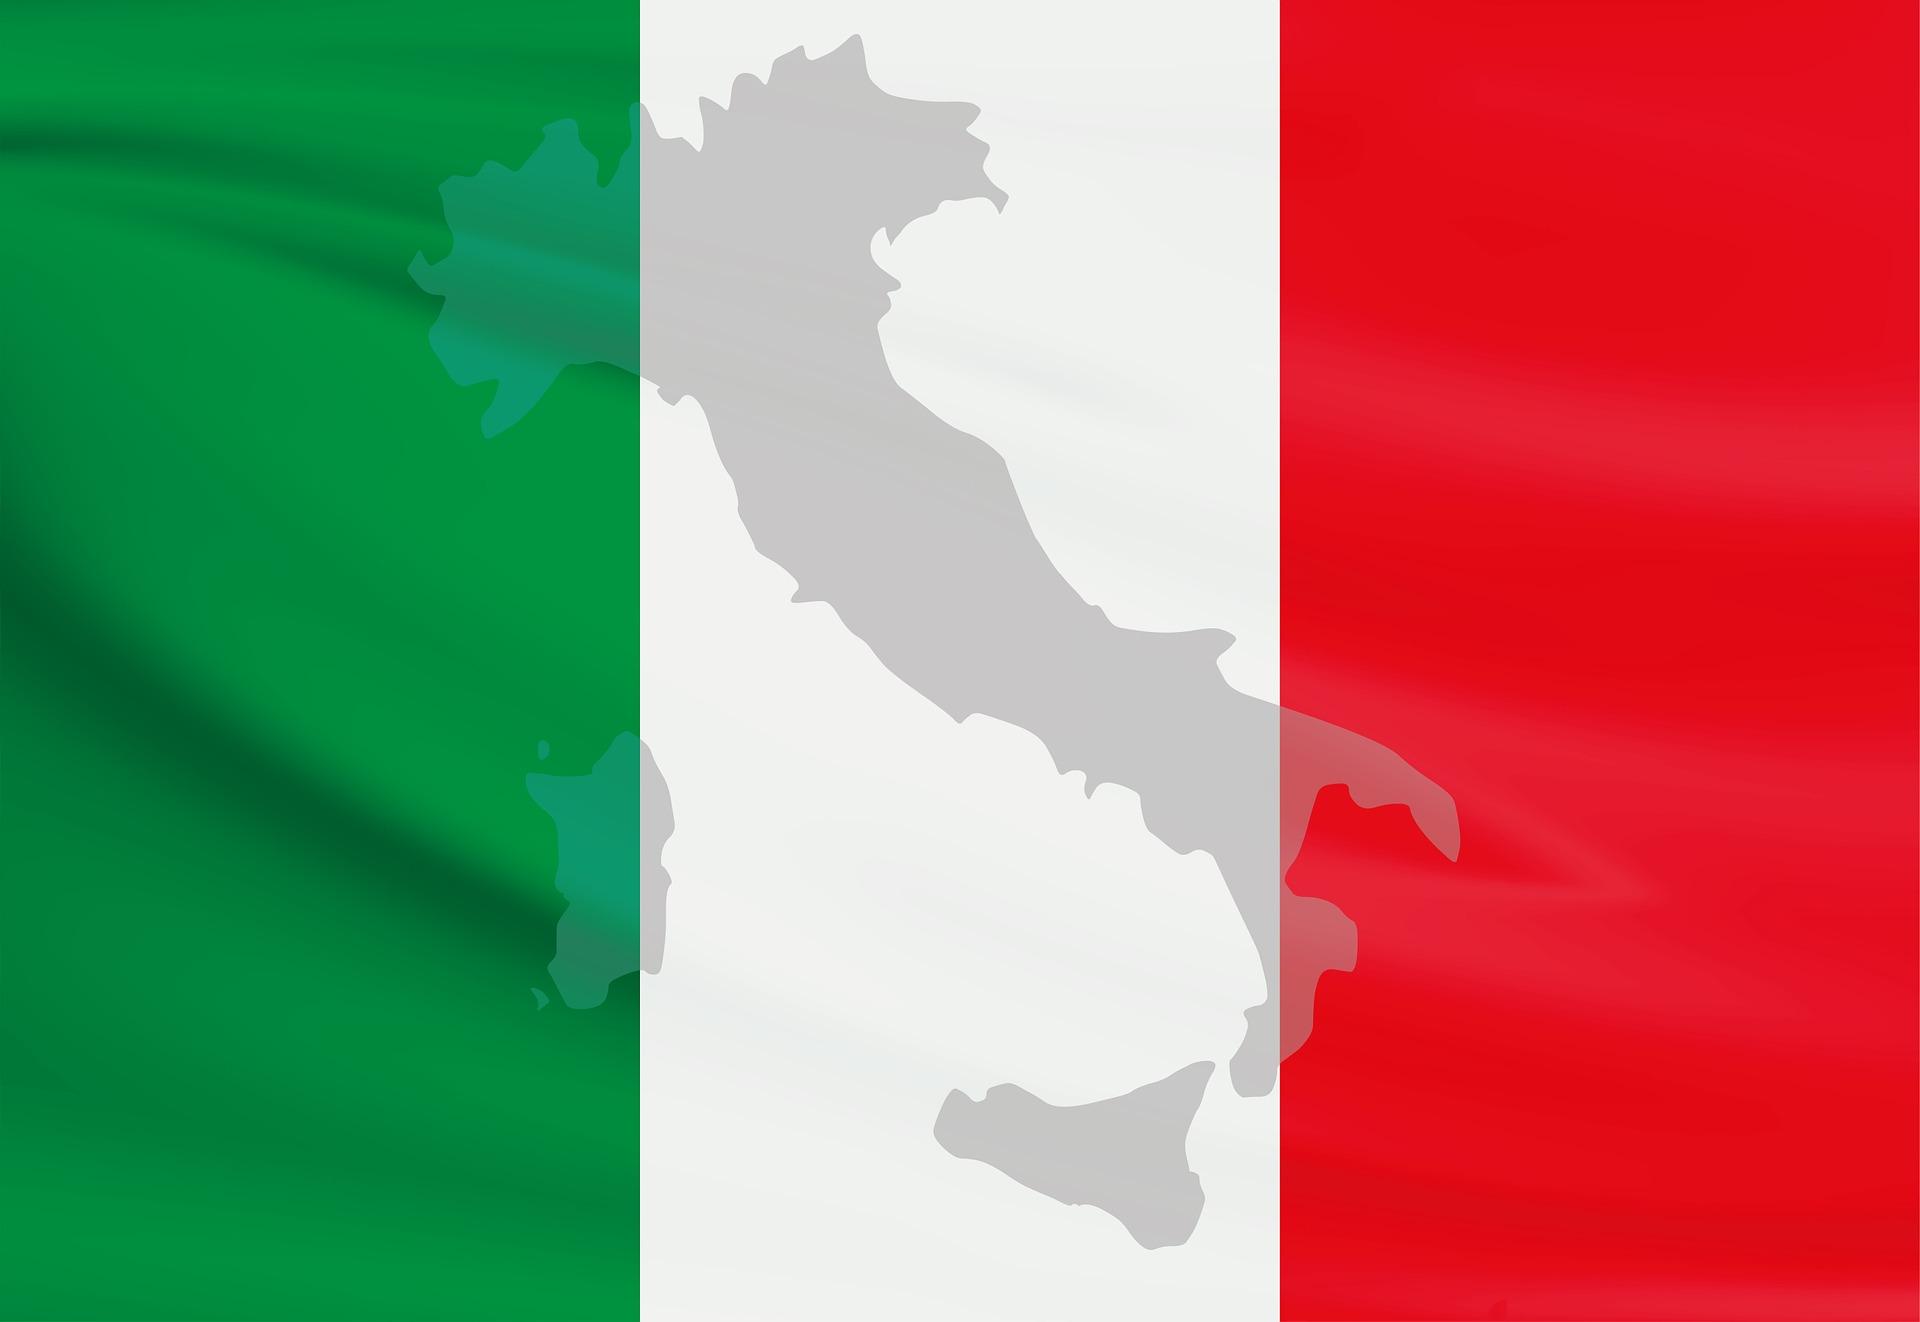 Italien - premiers pas - UPVD